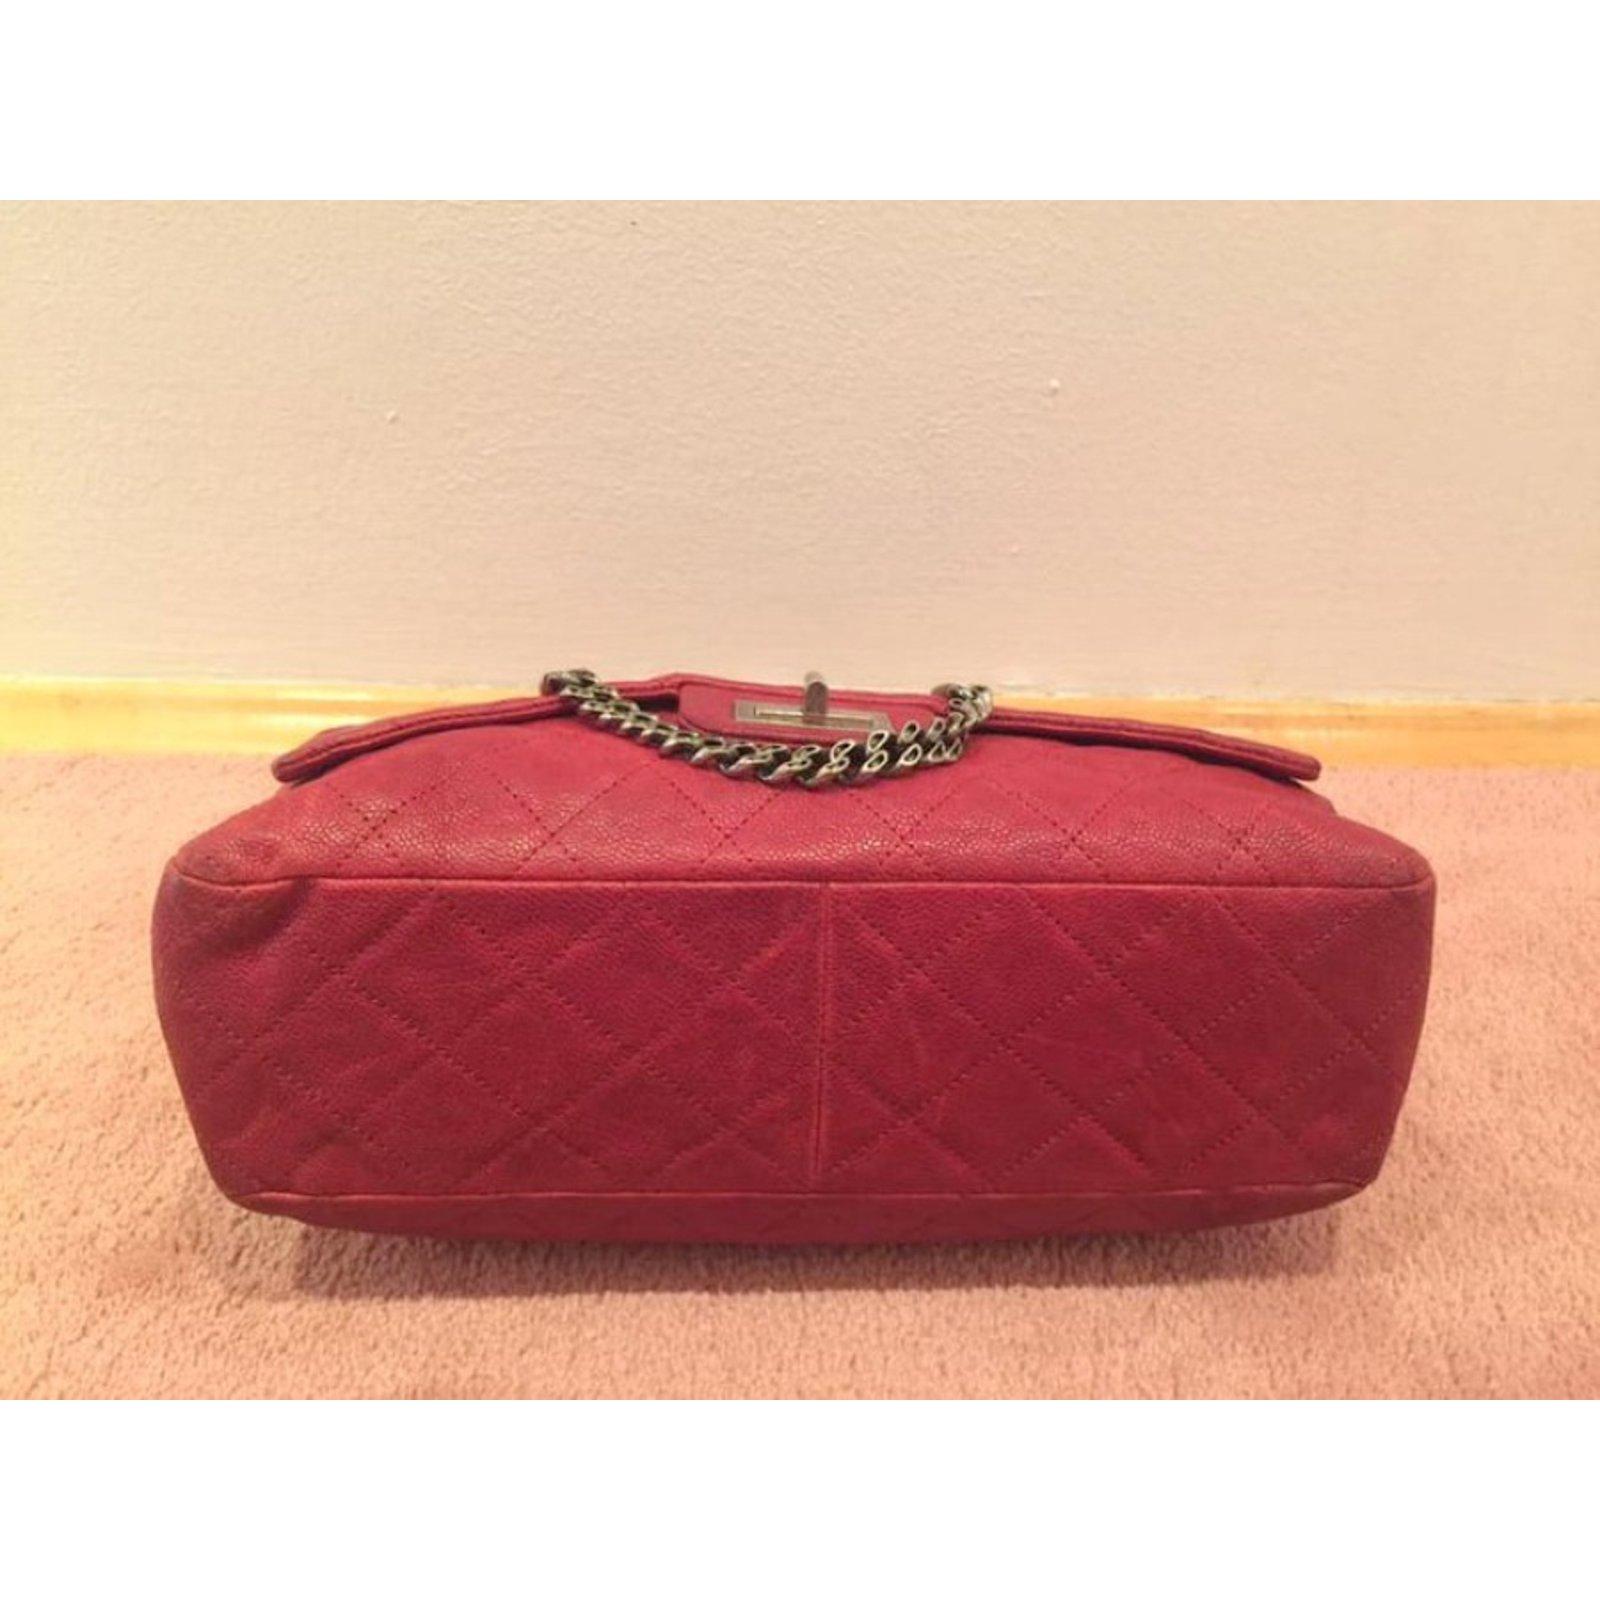 c03fa800cff5 Chanel 2.55 Bag Handbags Leather Other ref.84298 - Joli Closet